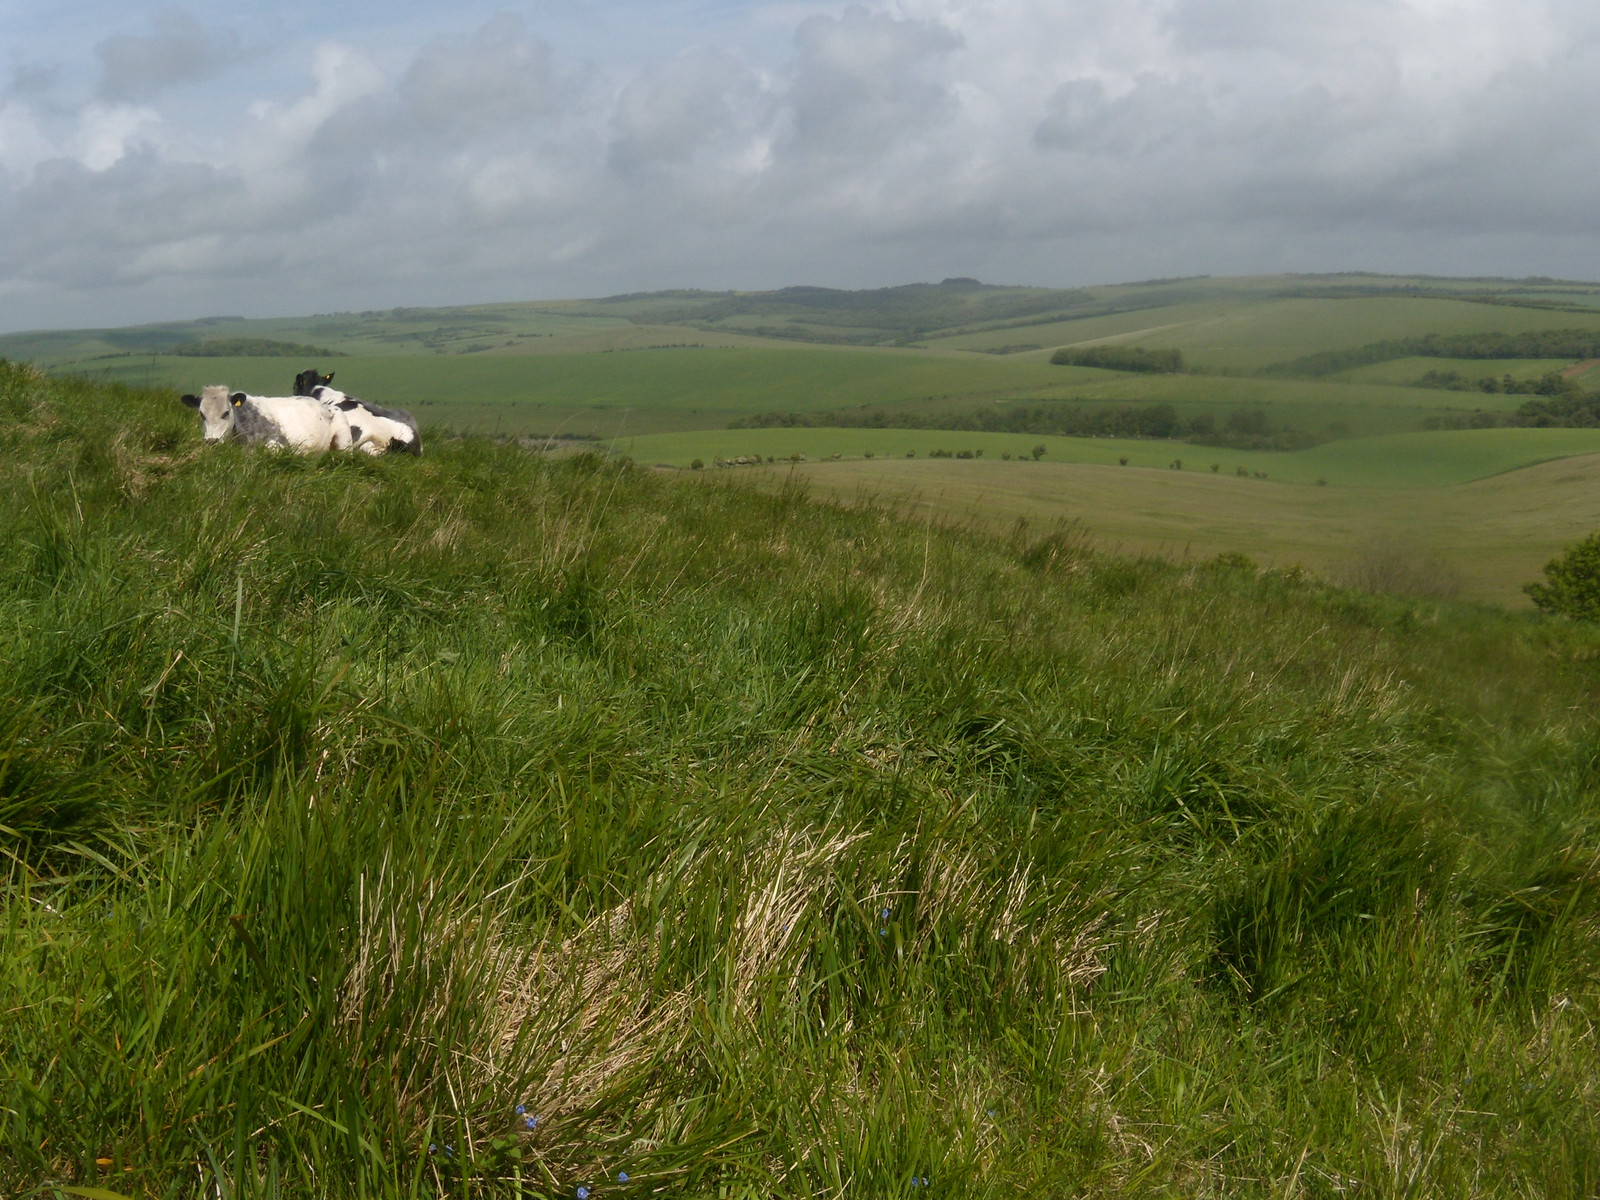 Cows'n'scenery Lewes circular via Rodmell